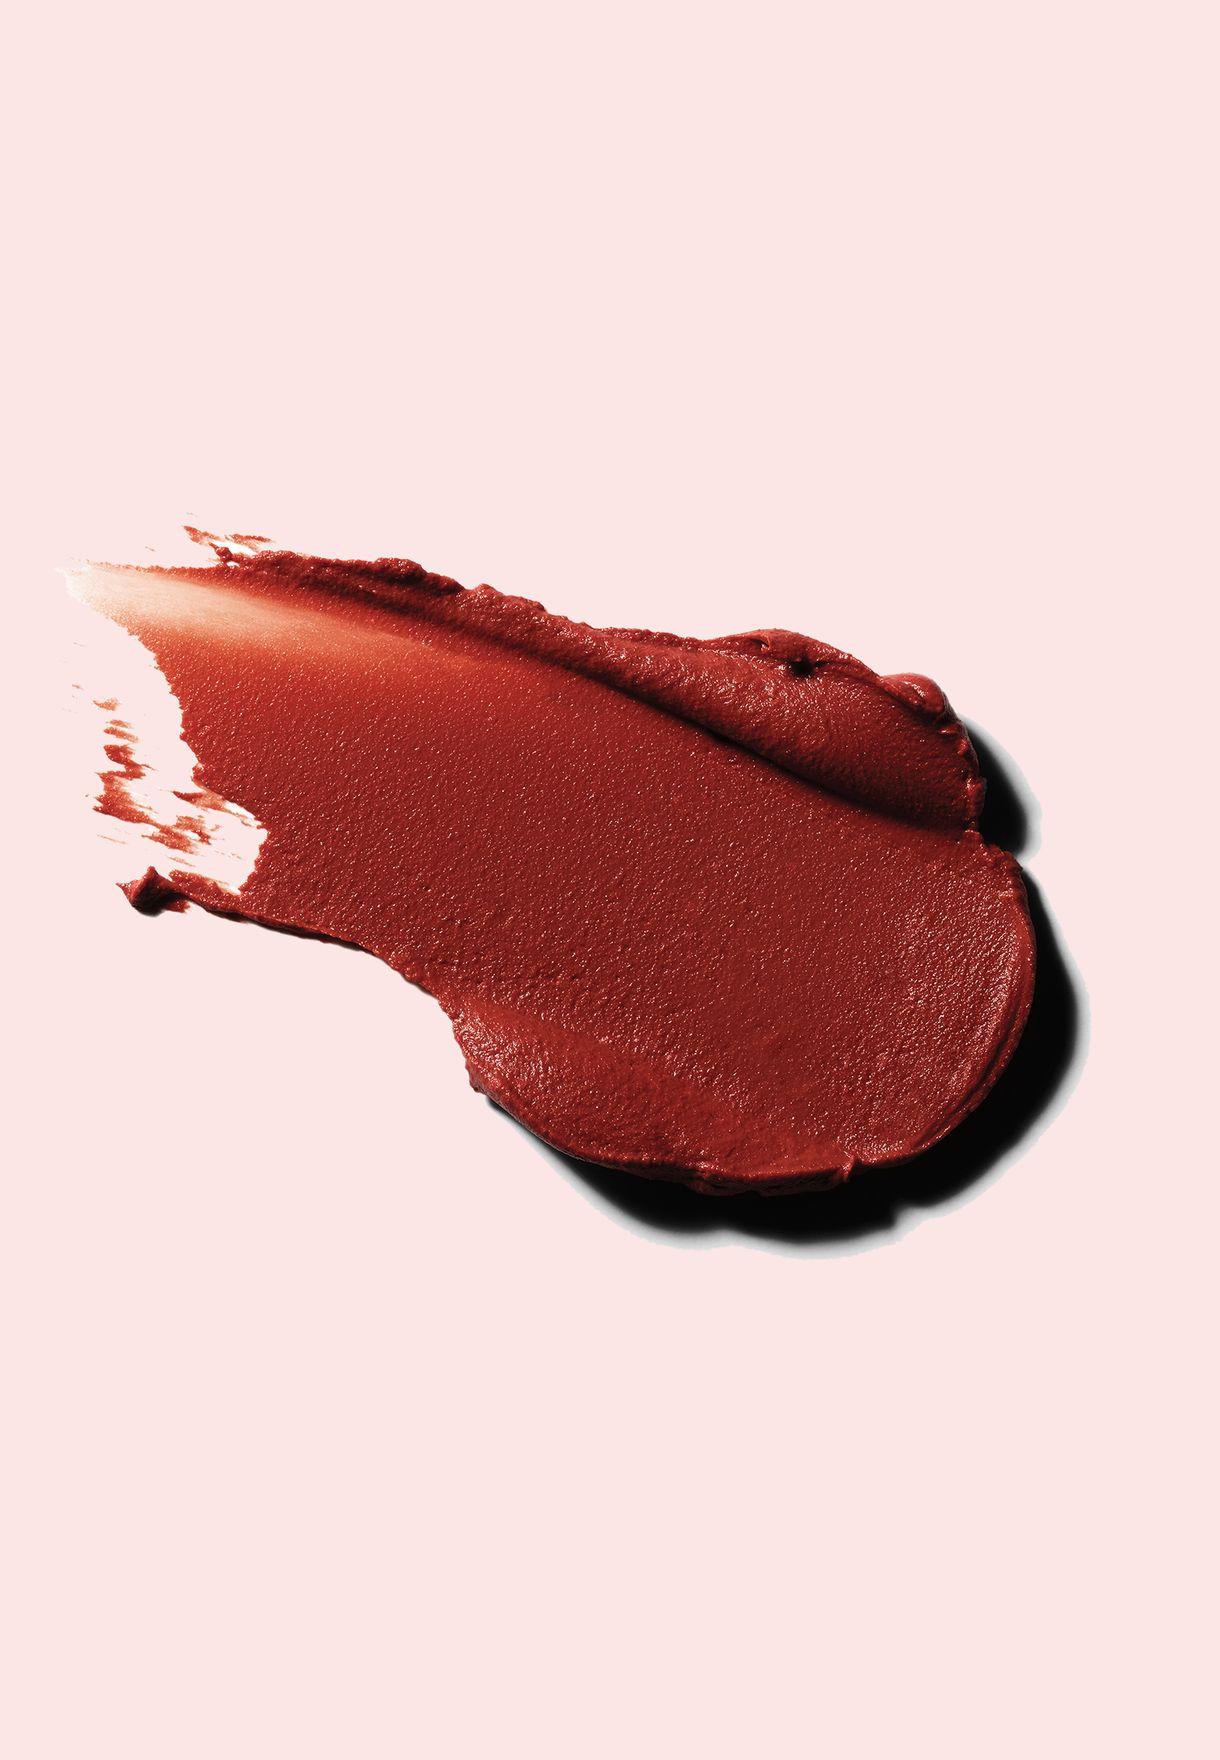 احمر شفاه باودر كيس السائل - ان لوف ويذ مراكش